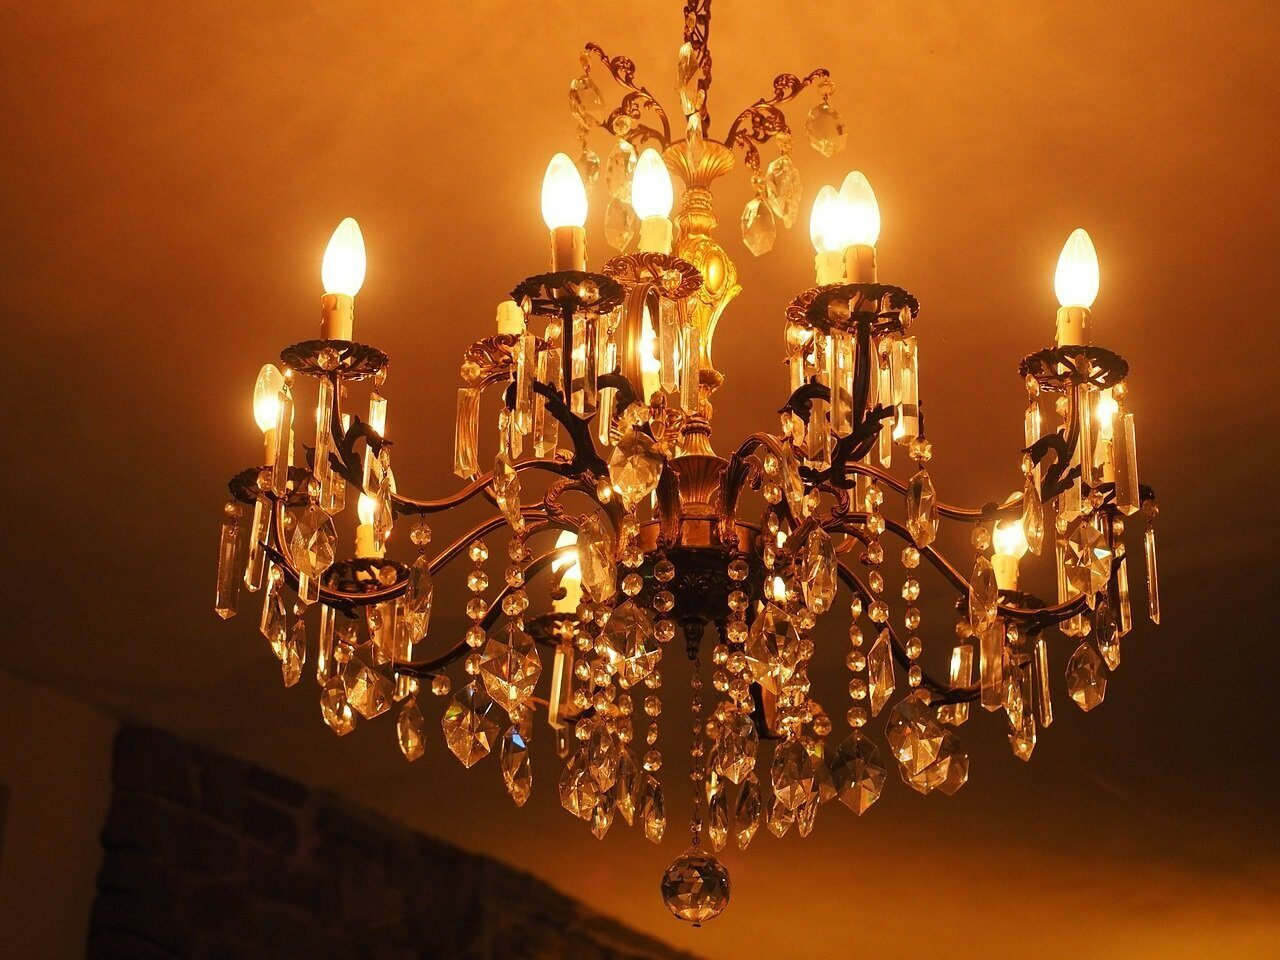 candlestick-590900_1280